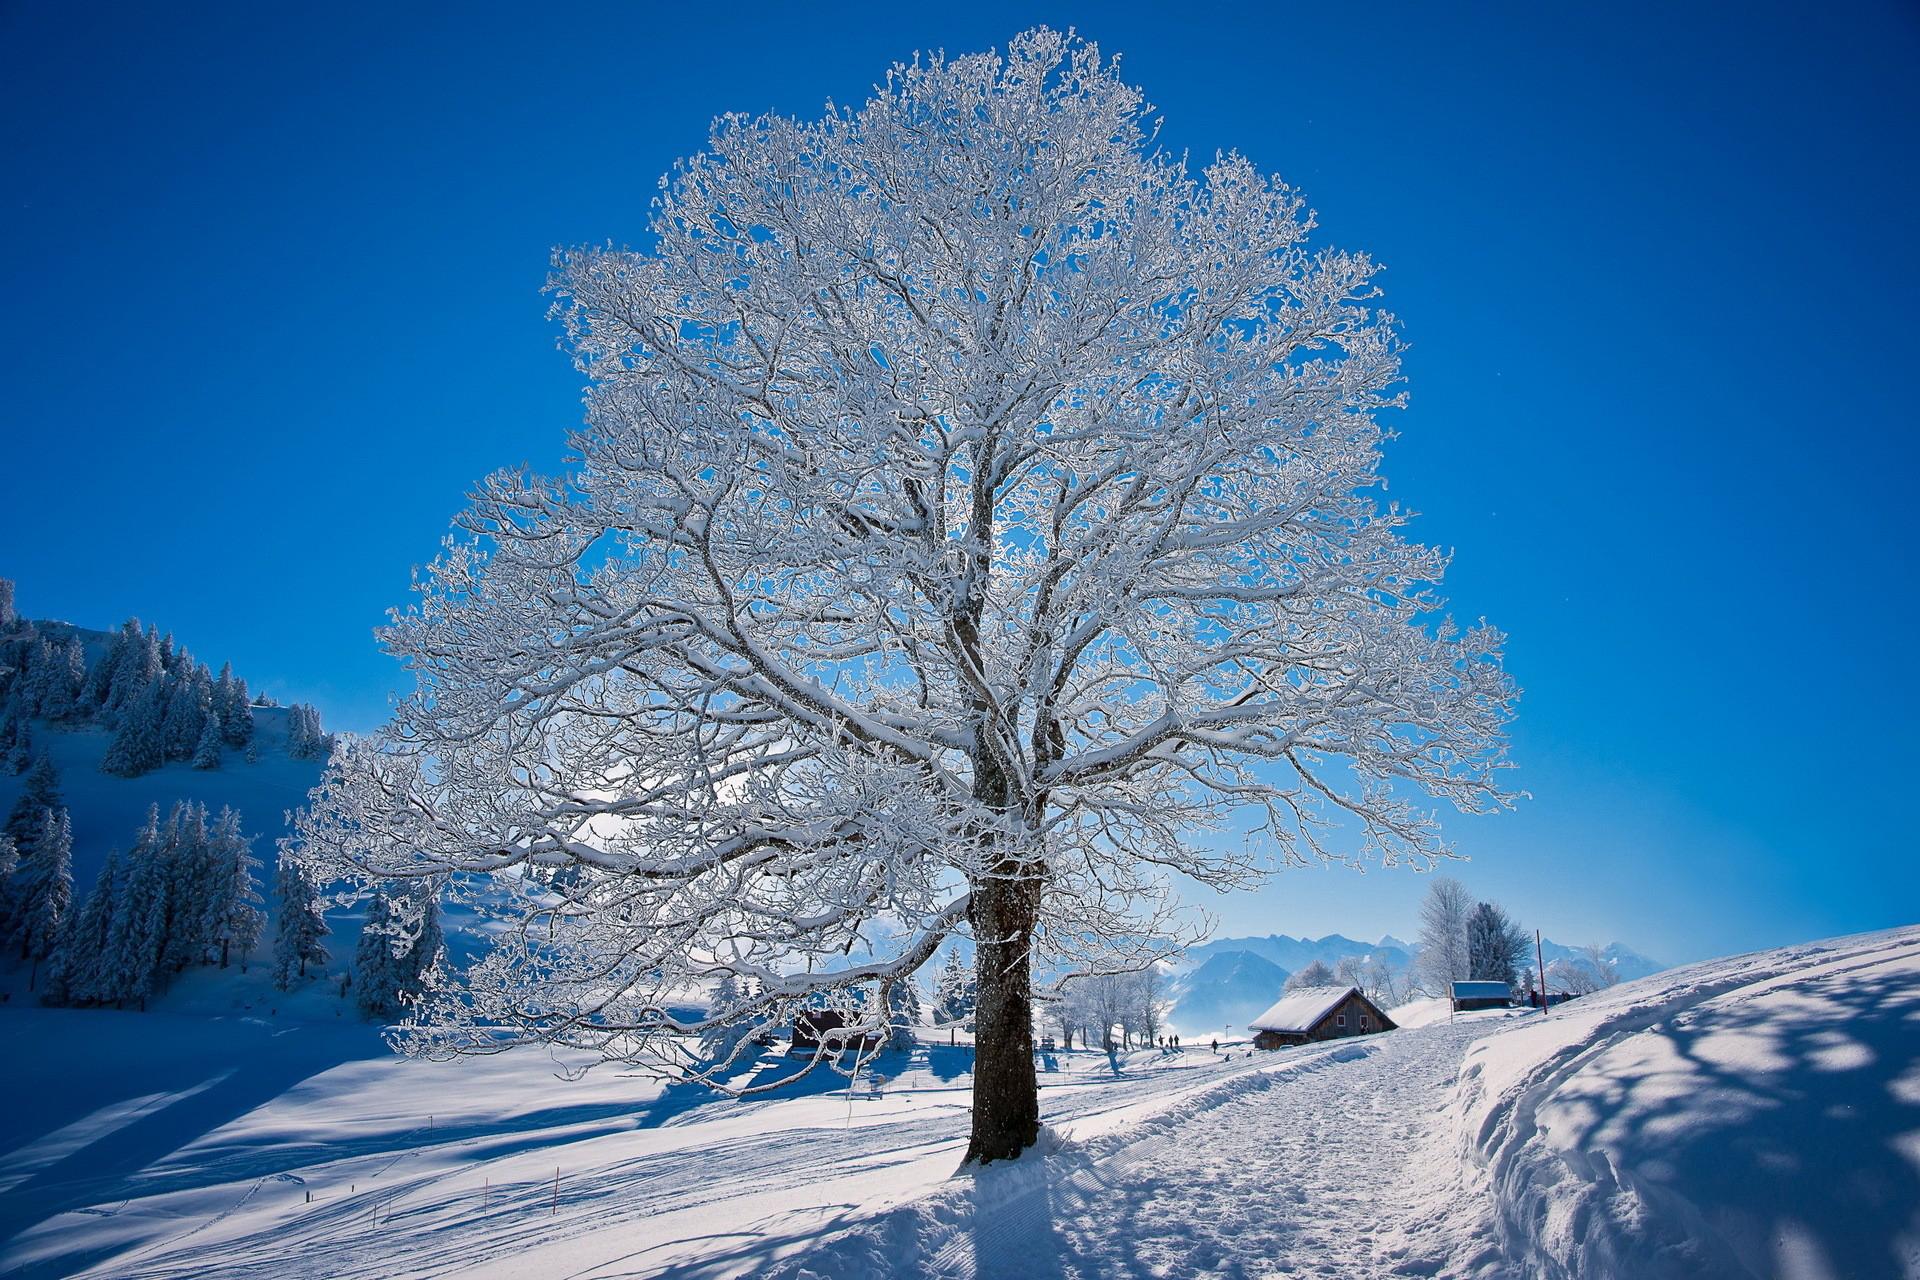 Winter HD Wallpaper | Background Image | 1920x1280 | ID ...